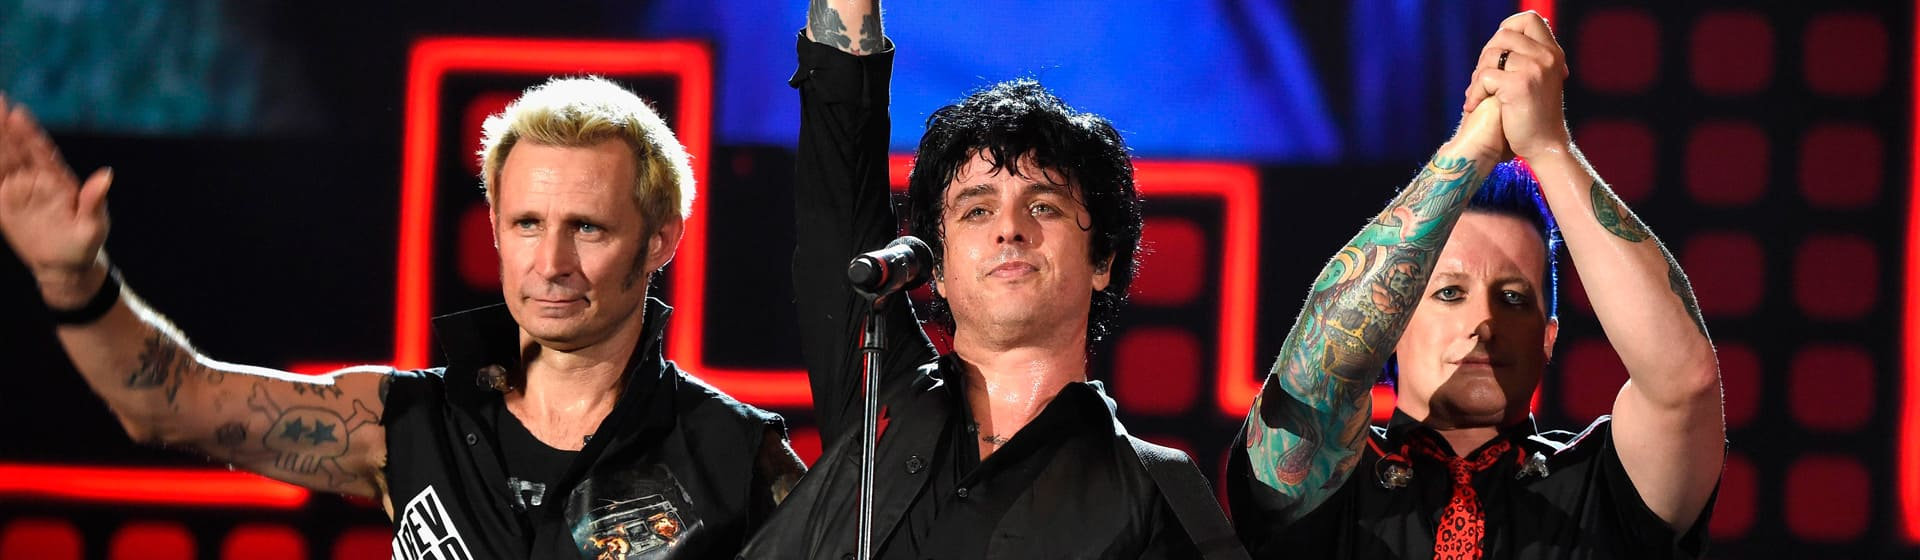 Green Day - Мерч и одежда с атрибутикой